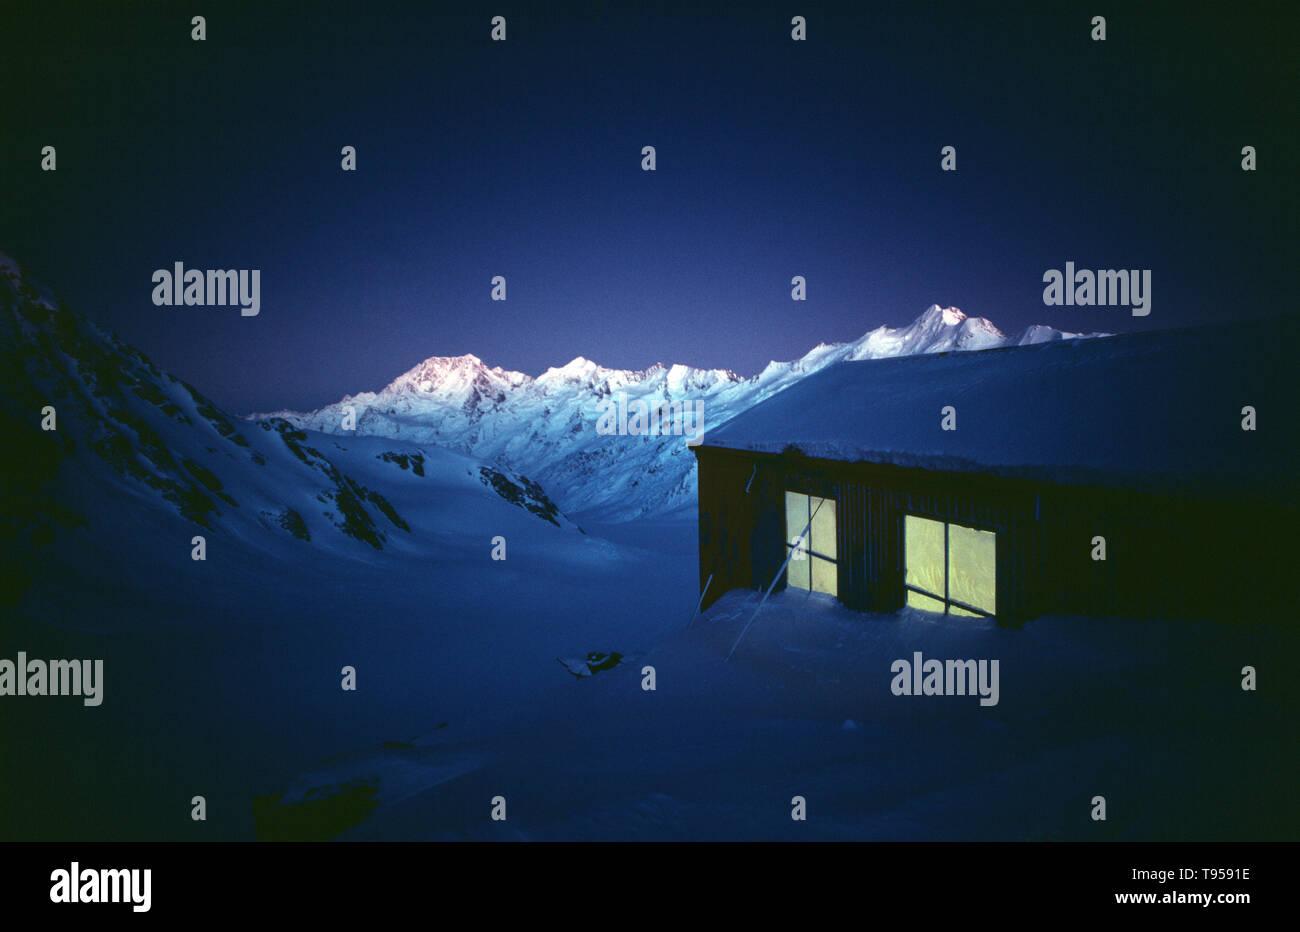 New Zealand. South Island. Canterbury. Ski lodge. Late evening. Tasman Glacier. - Stock Image